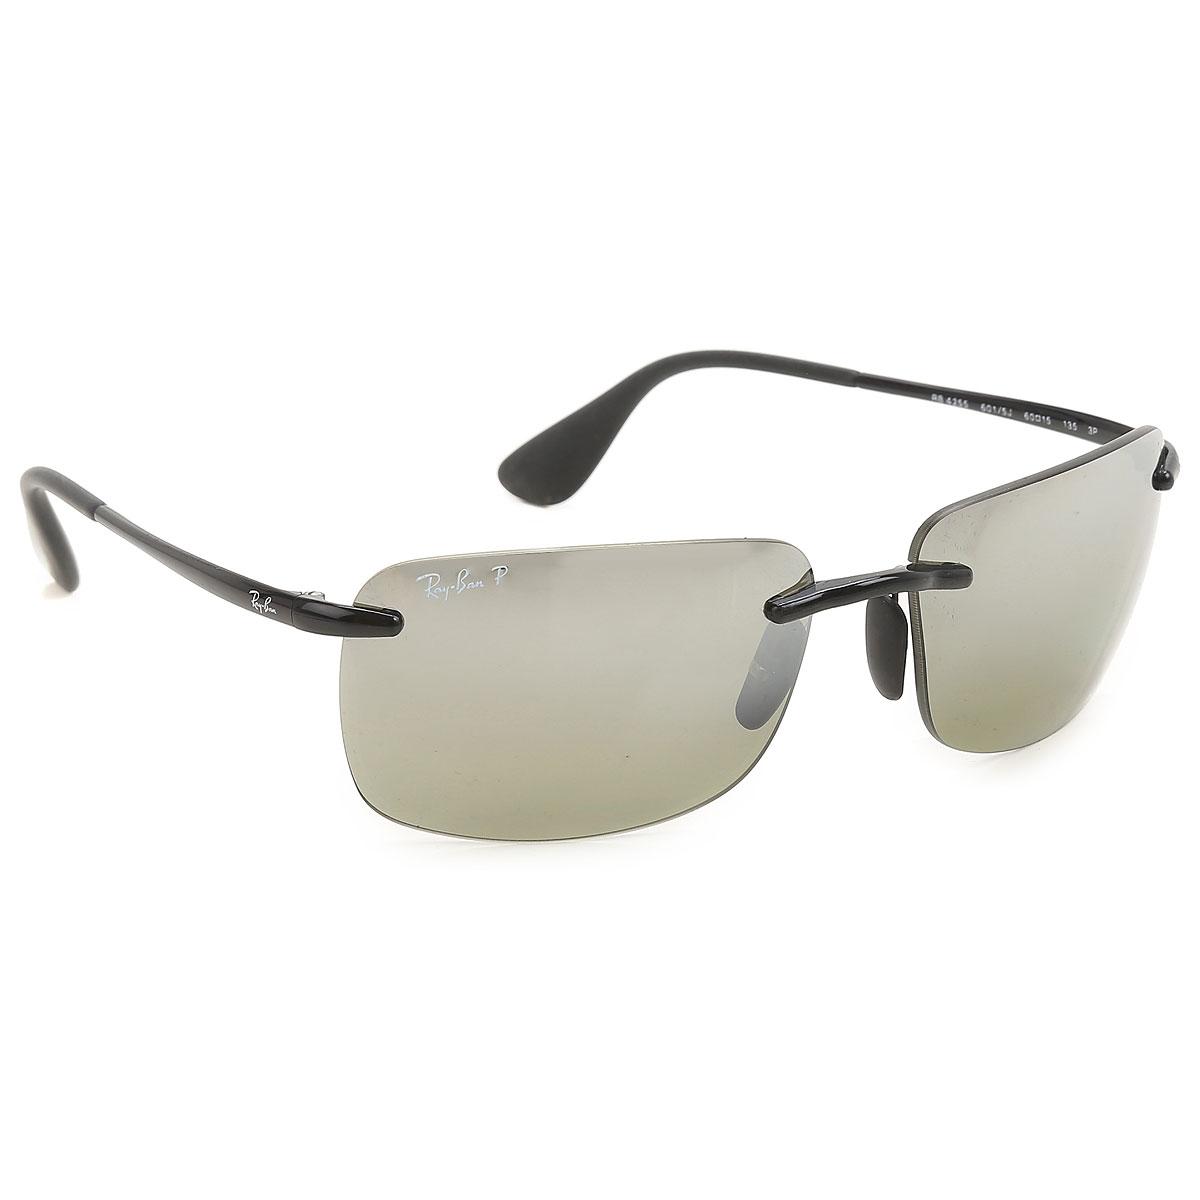 Gafas y Lentes de Sol Ray Ban, Detalle Modelo: rb4255-601-5j